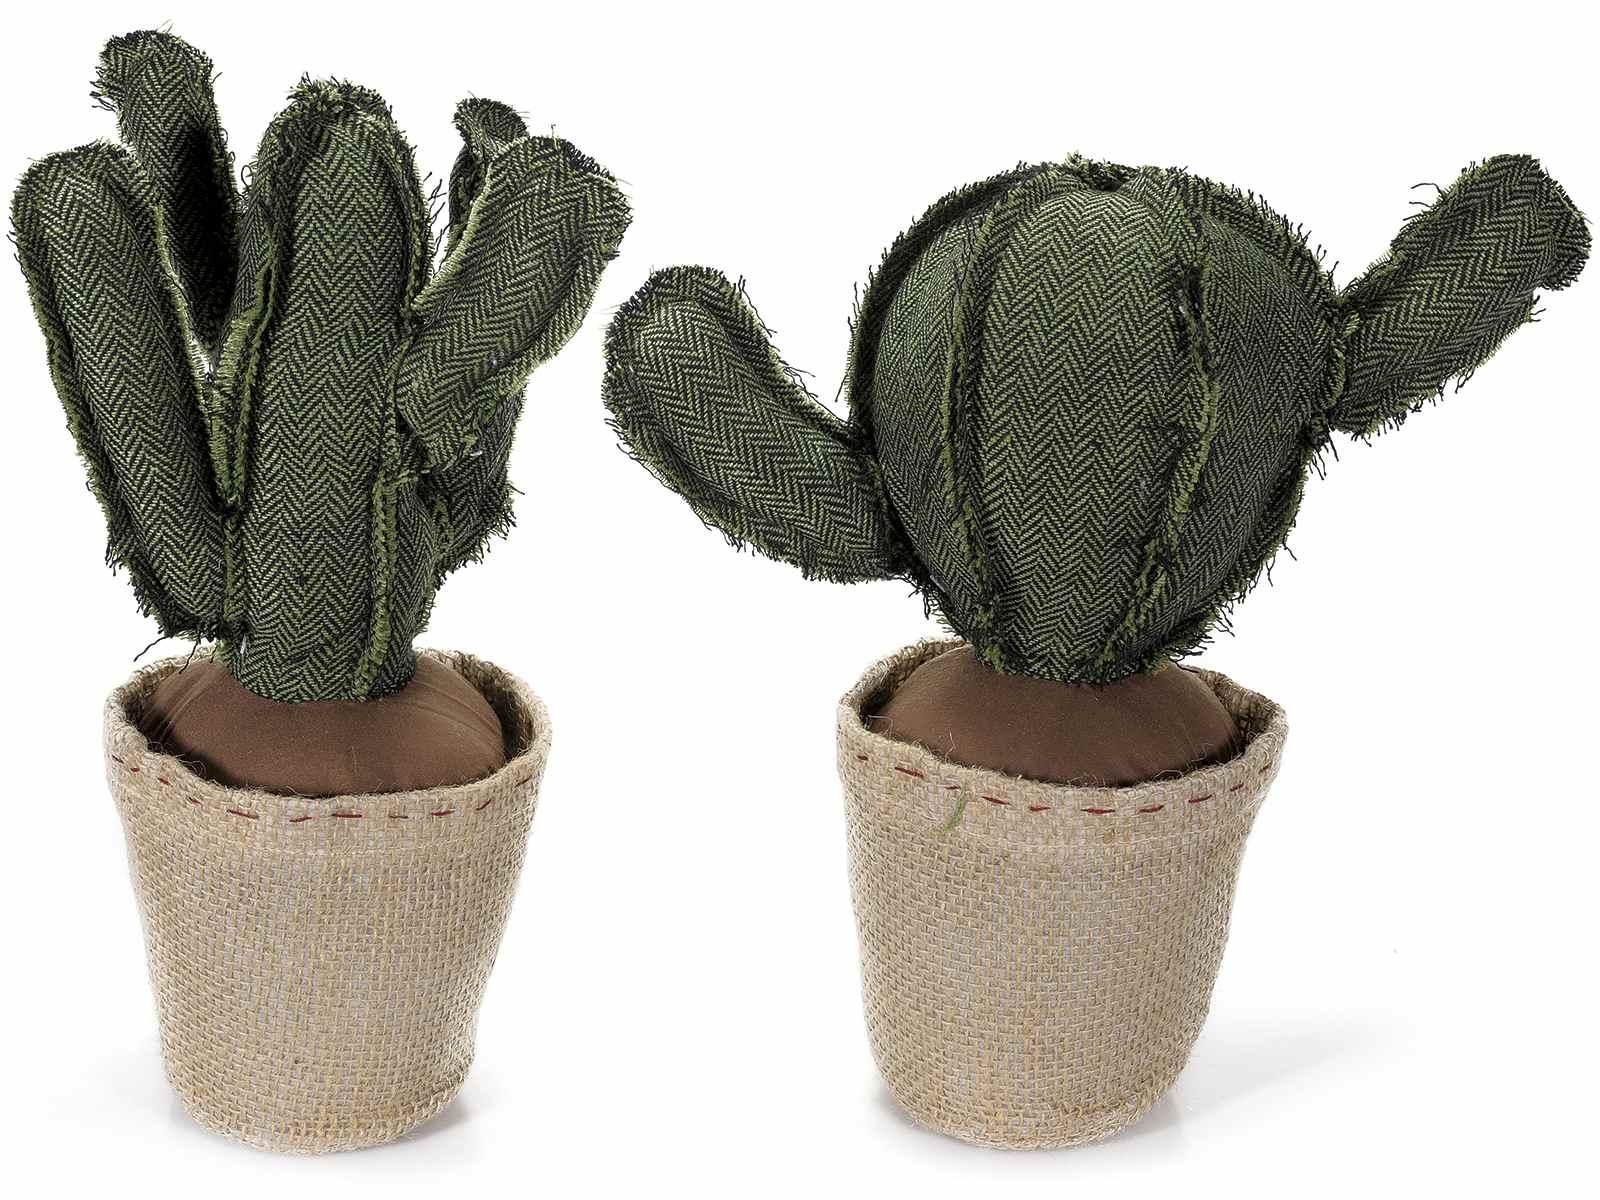 Fermaporta cactus in stoffa imbottita art - Fermaporta di stoffa ...